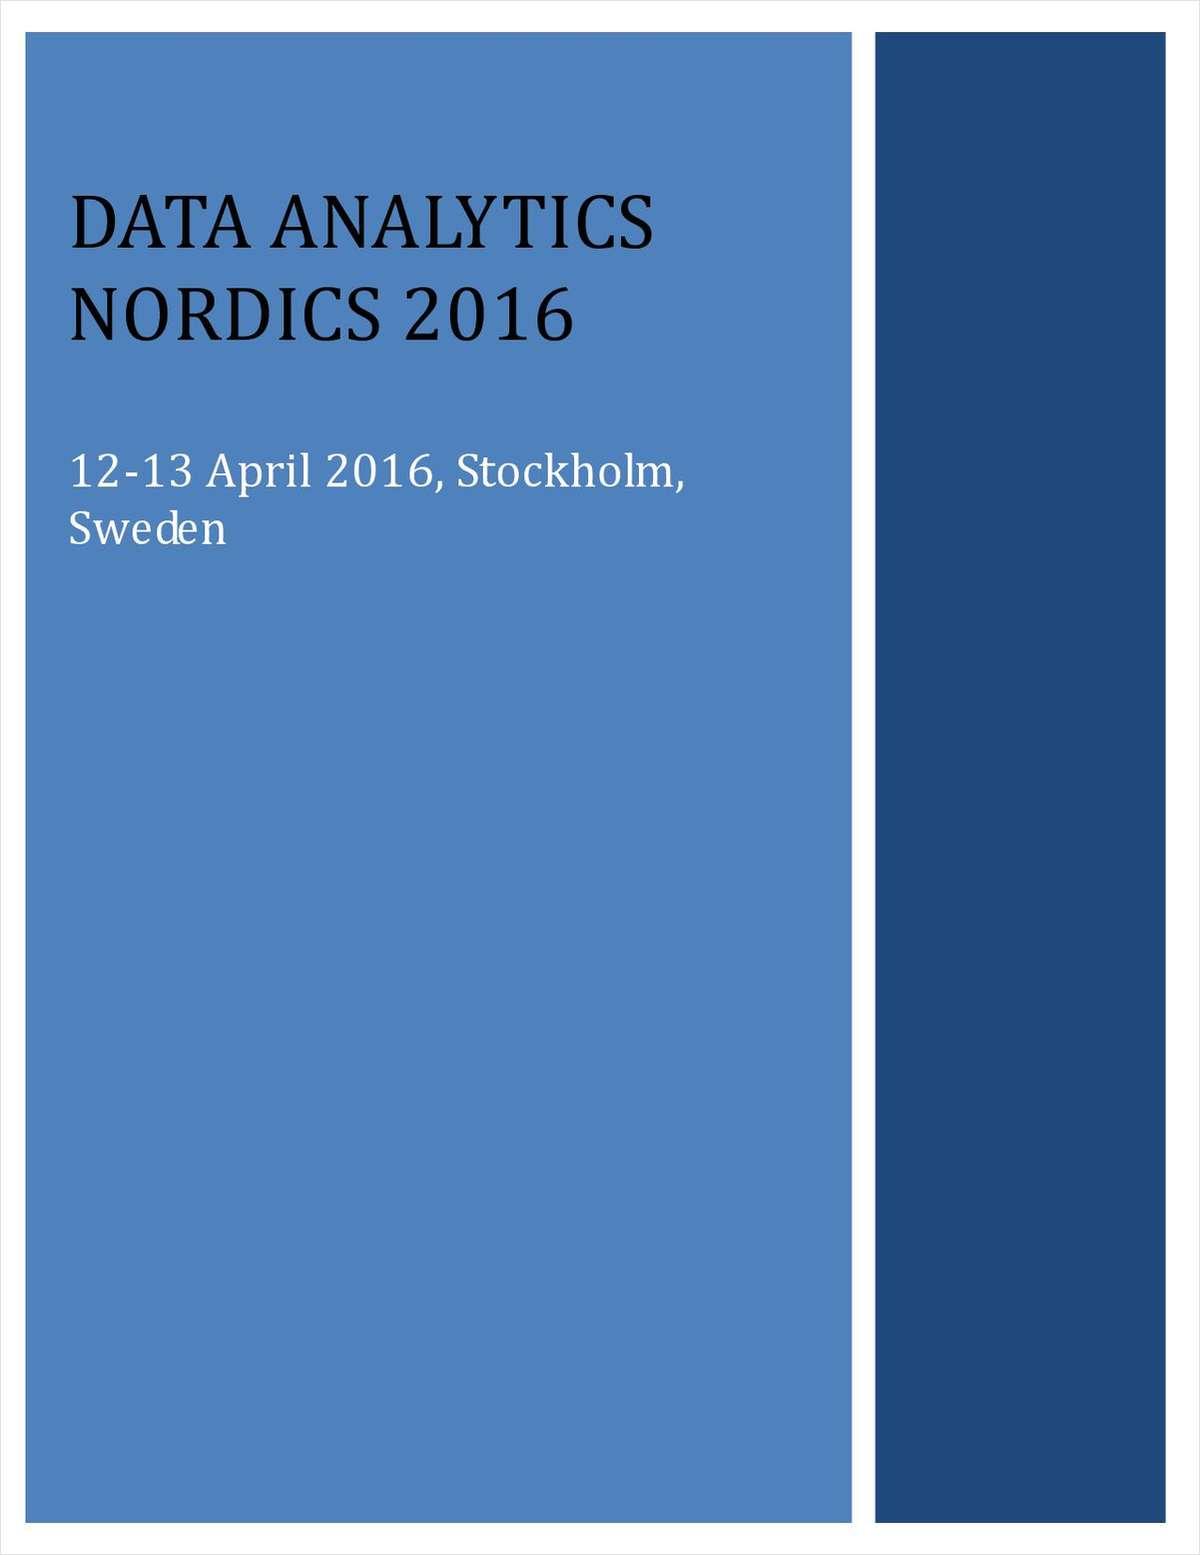 Data Analytics Nordics Preliminary Agenda